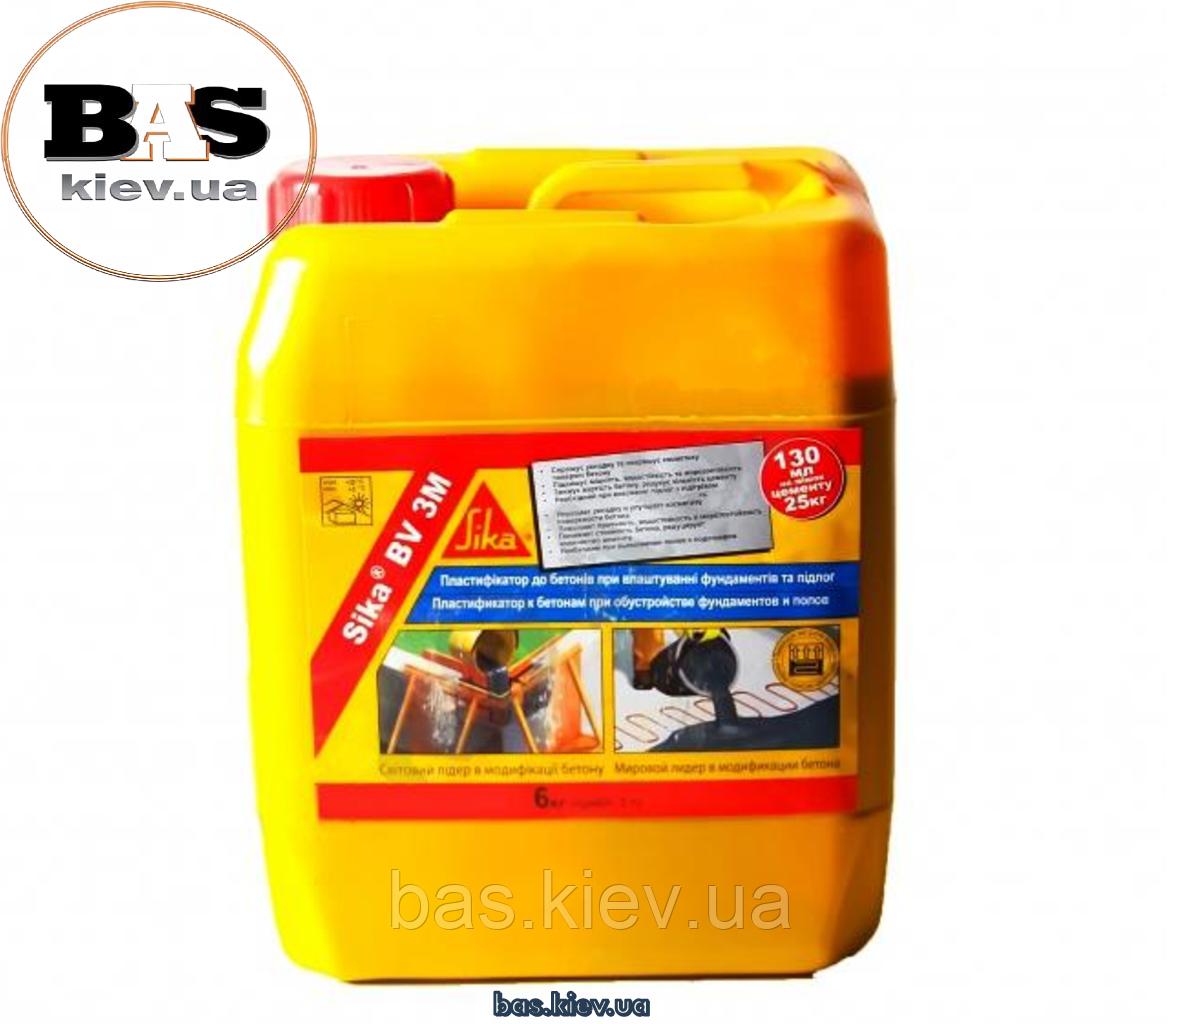 Sika BV 3 M UA пластифицирующая добавка для бетона и растворов , 10 кг